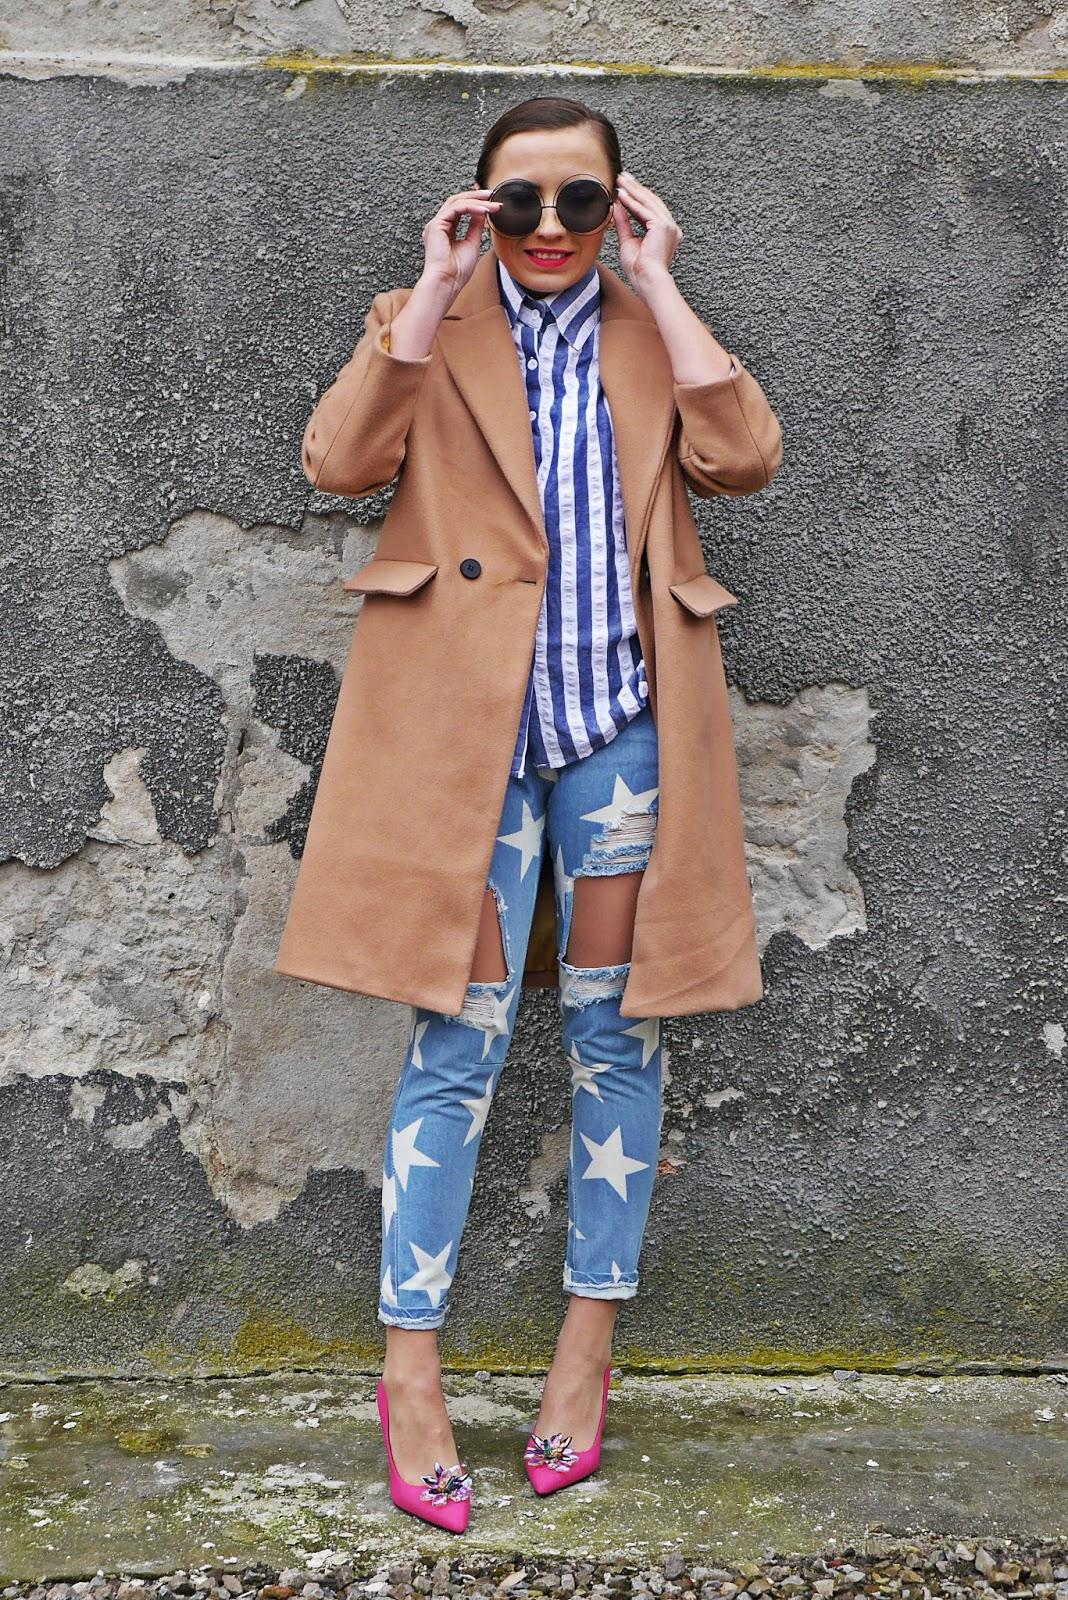 4_pink_heels_renee_baige_coat_stars_jeans_stripes_shirt_karyn_blog_modowy_040218asd